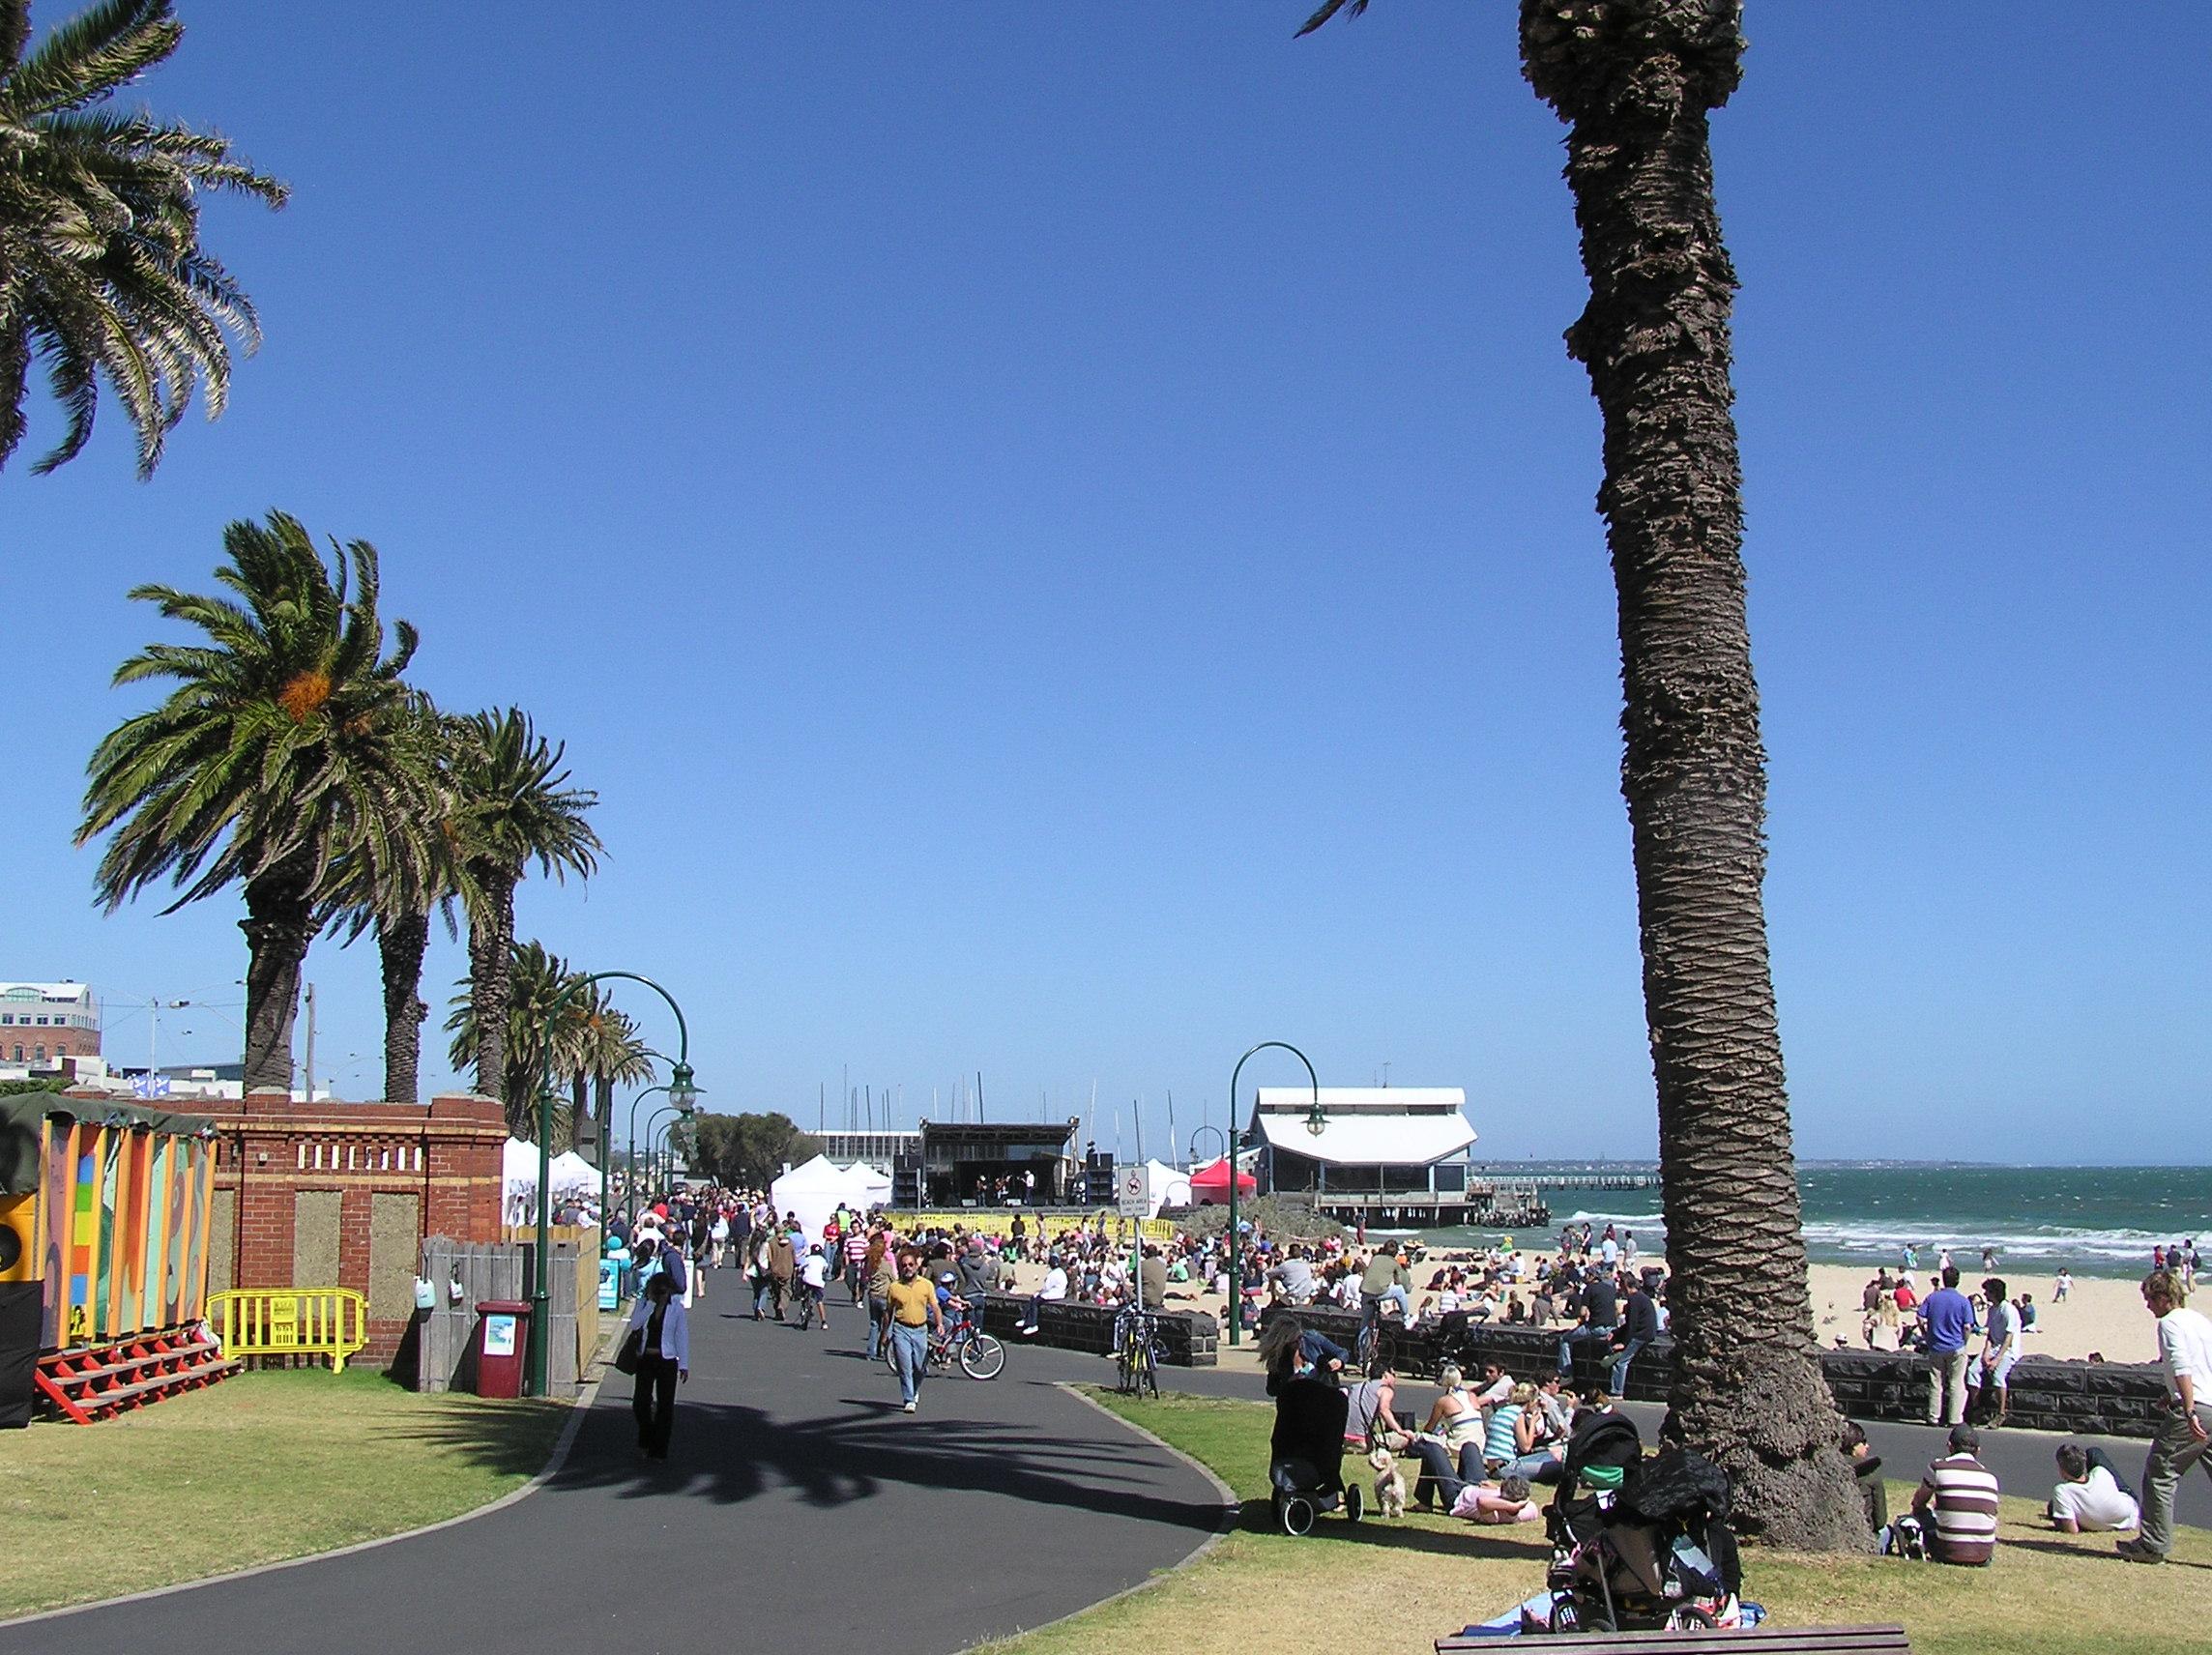 Beach Music Festival Staunton Va Pm